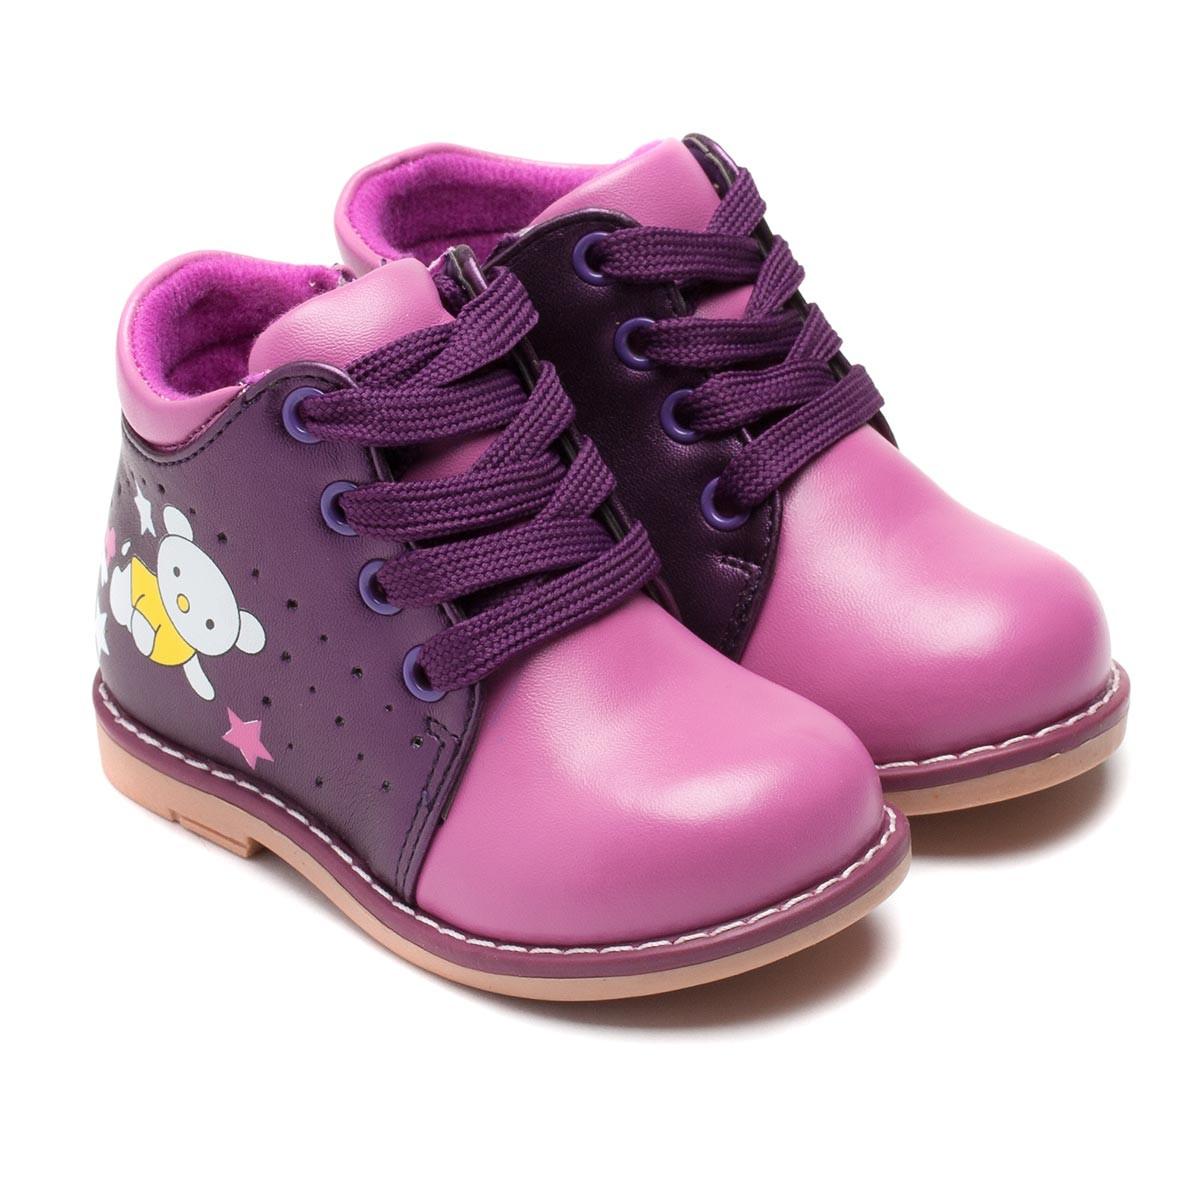 Весенние ботинки Шалунишка - Ортопед для девочки d9456c94ba85e